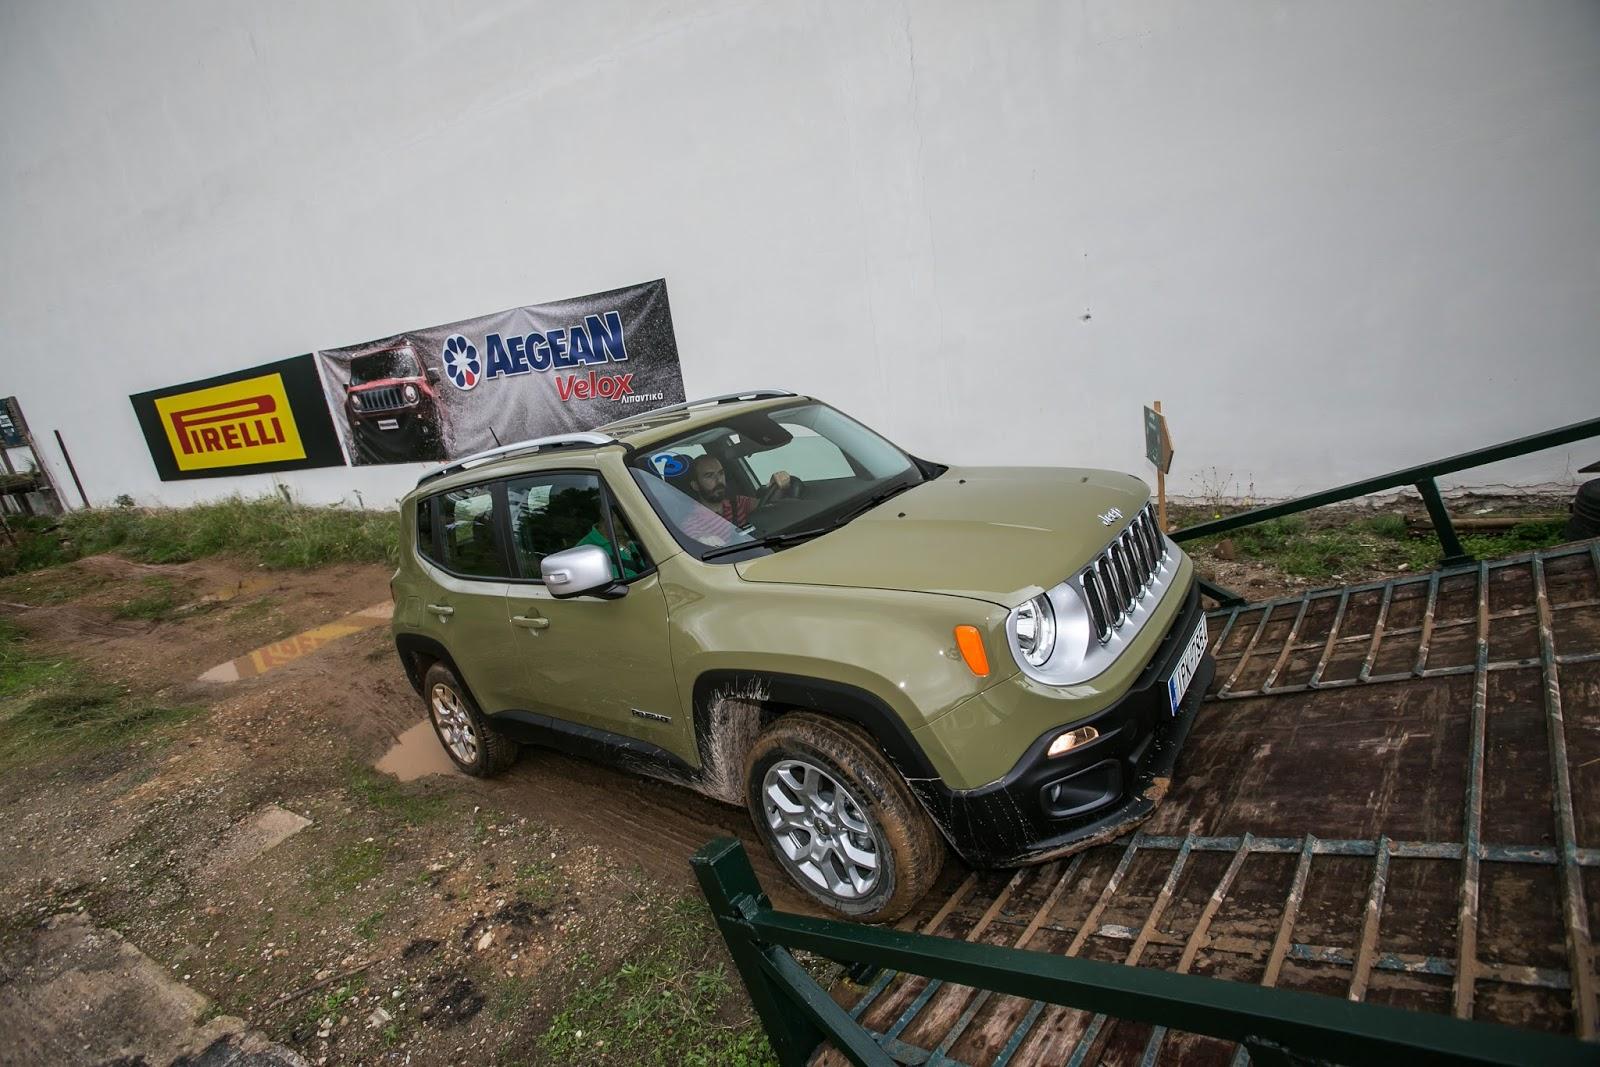 GK 0406 Πετάμε ένα Jeep Renegade σε λάσπες, πέτρες, άμμο, λίμνες. Θα τα καταφέρει; Jeep, Jeep Renegade, Renegade, SUV, TEST, zblog, ΔΟΚΙΜΕΣ